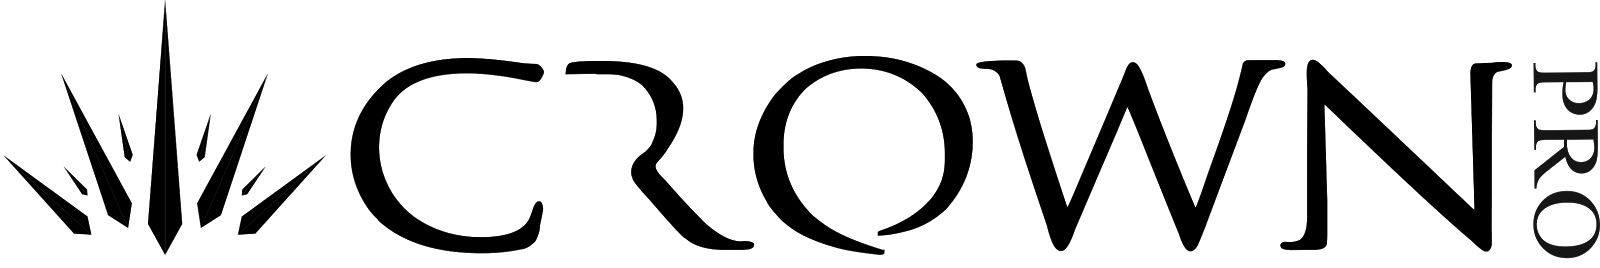 Image result for CROWN BRUSH LOGO